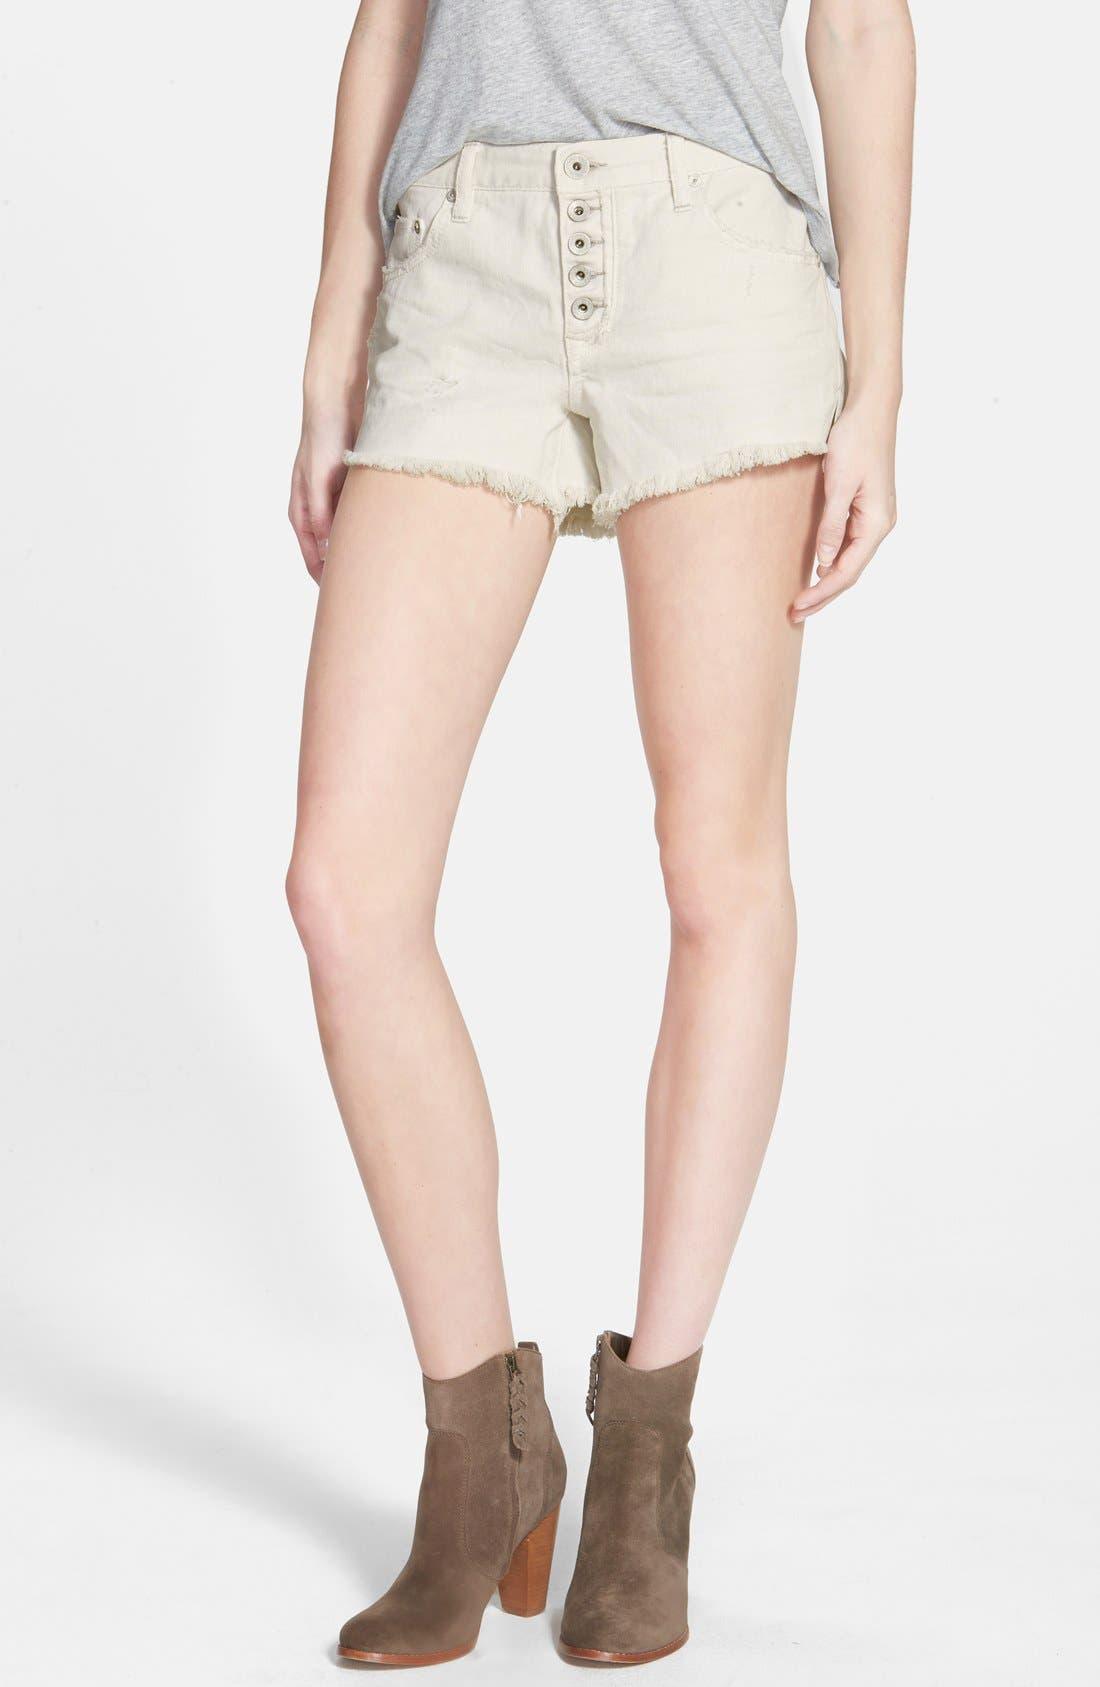 Alternate Image 1 Selected - Free People 'Runaway' Cutoff Denim Shorts (Polar White)